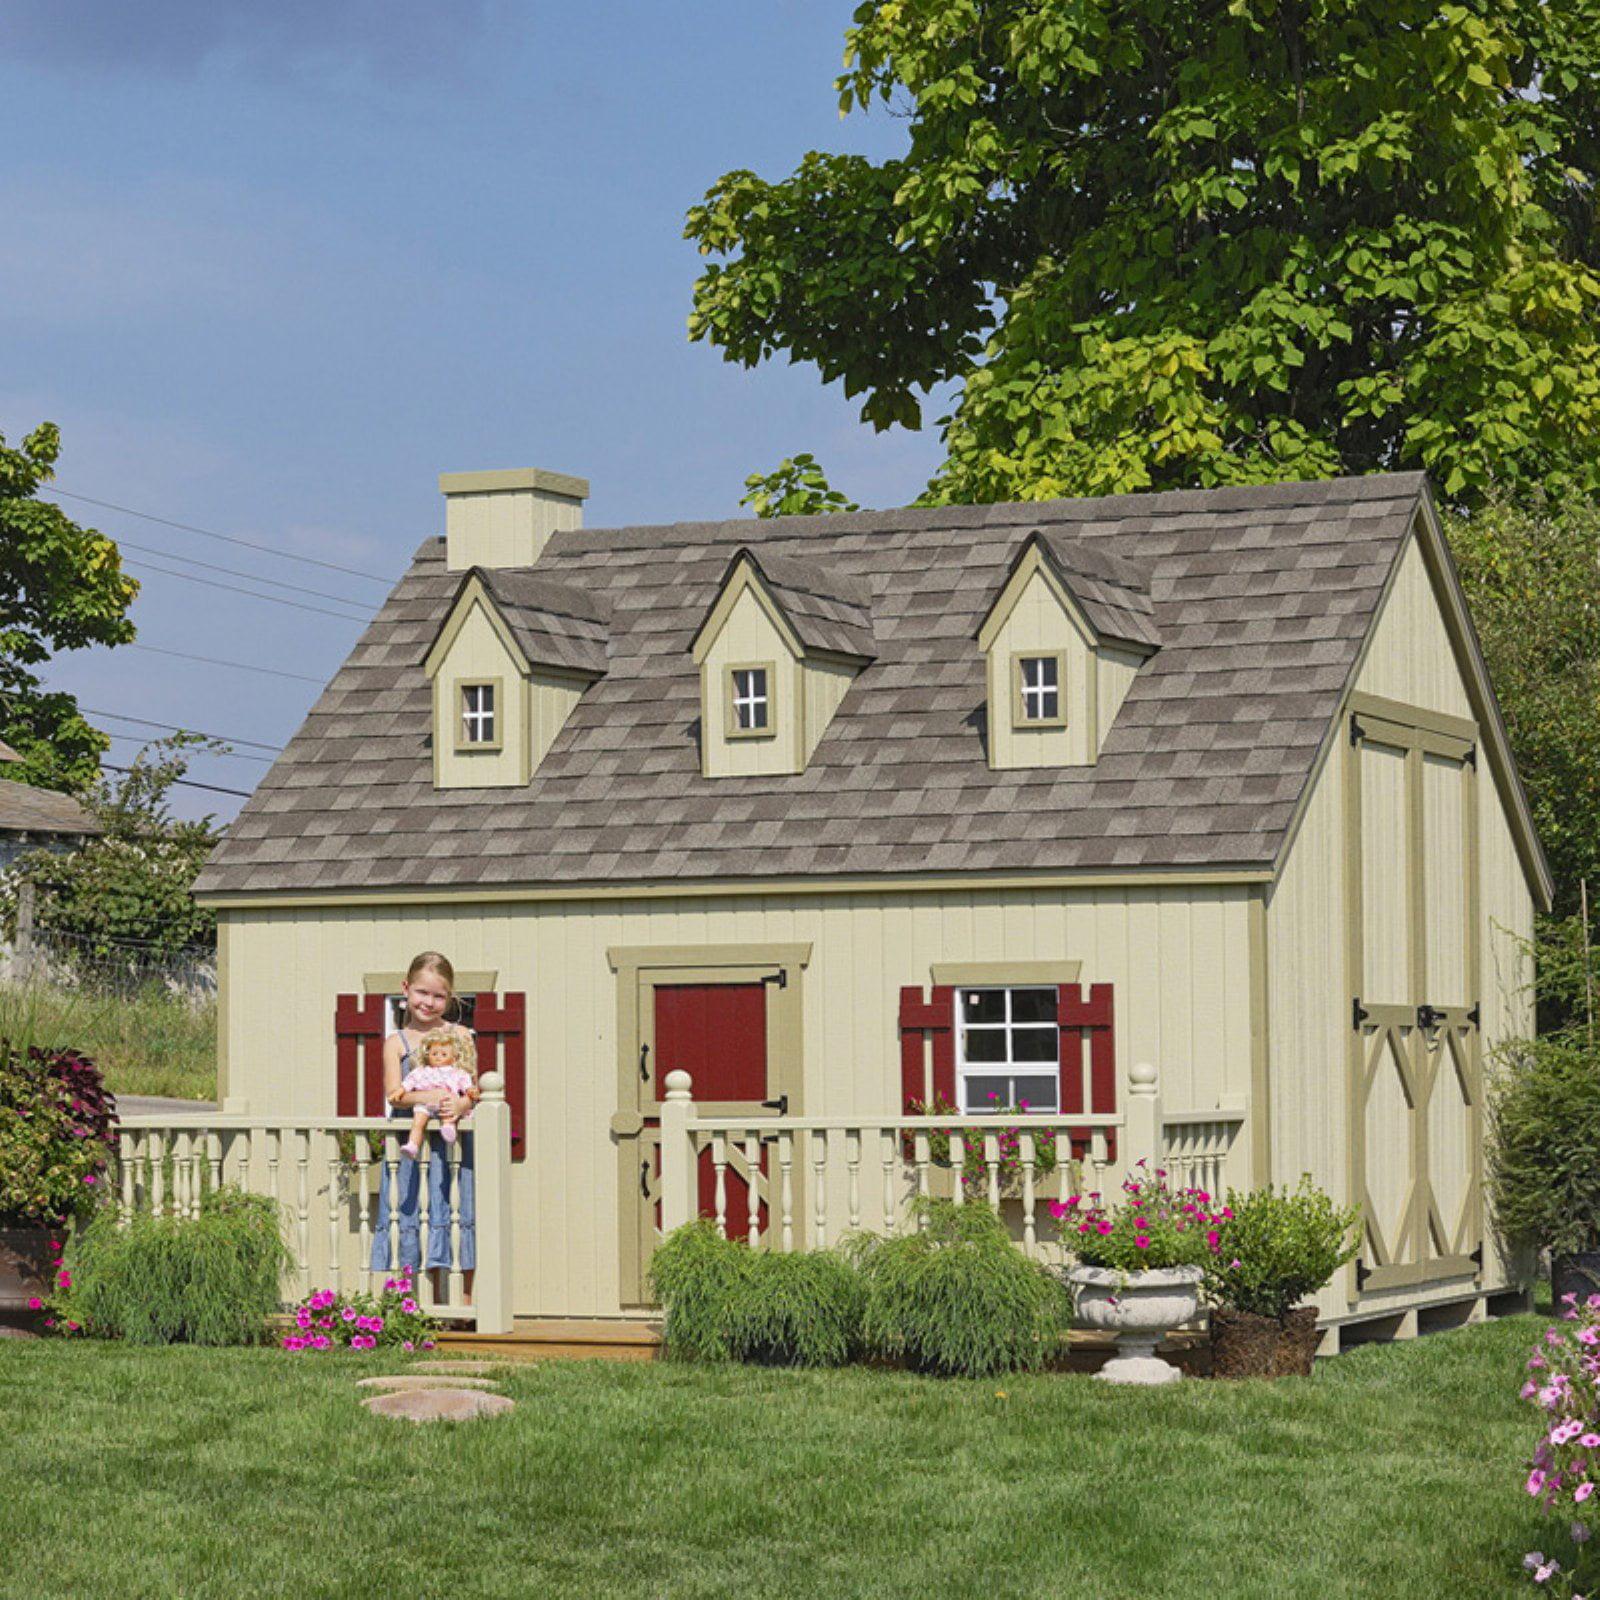 Little Cottage Cape Cod 8 x 10 ft. Wood Playhouse